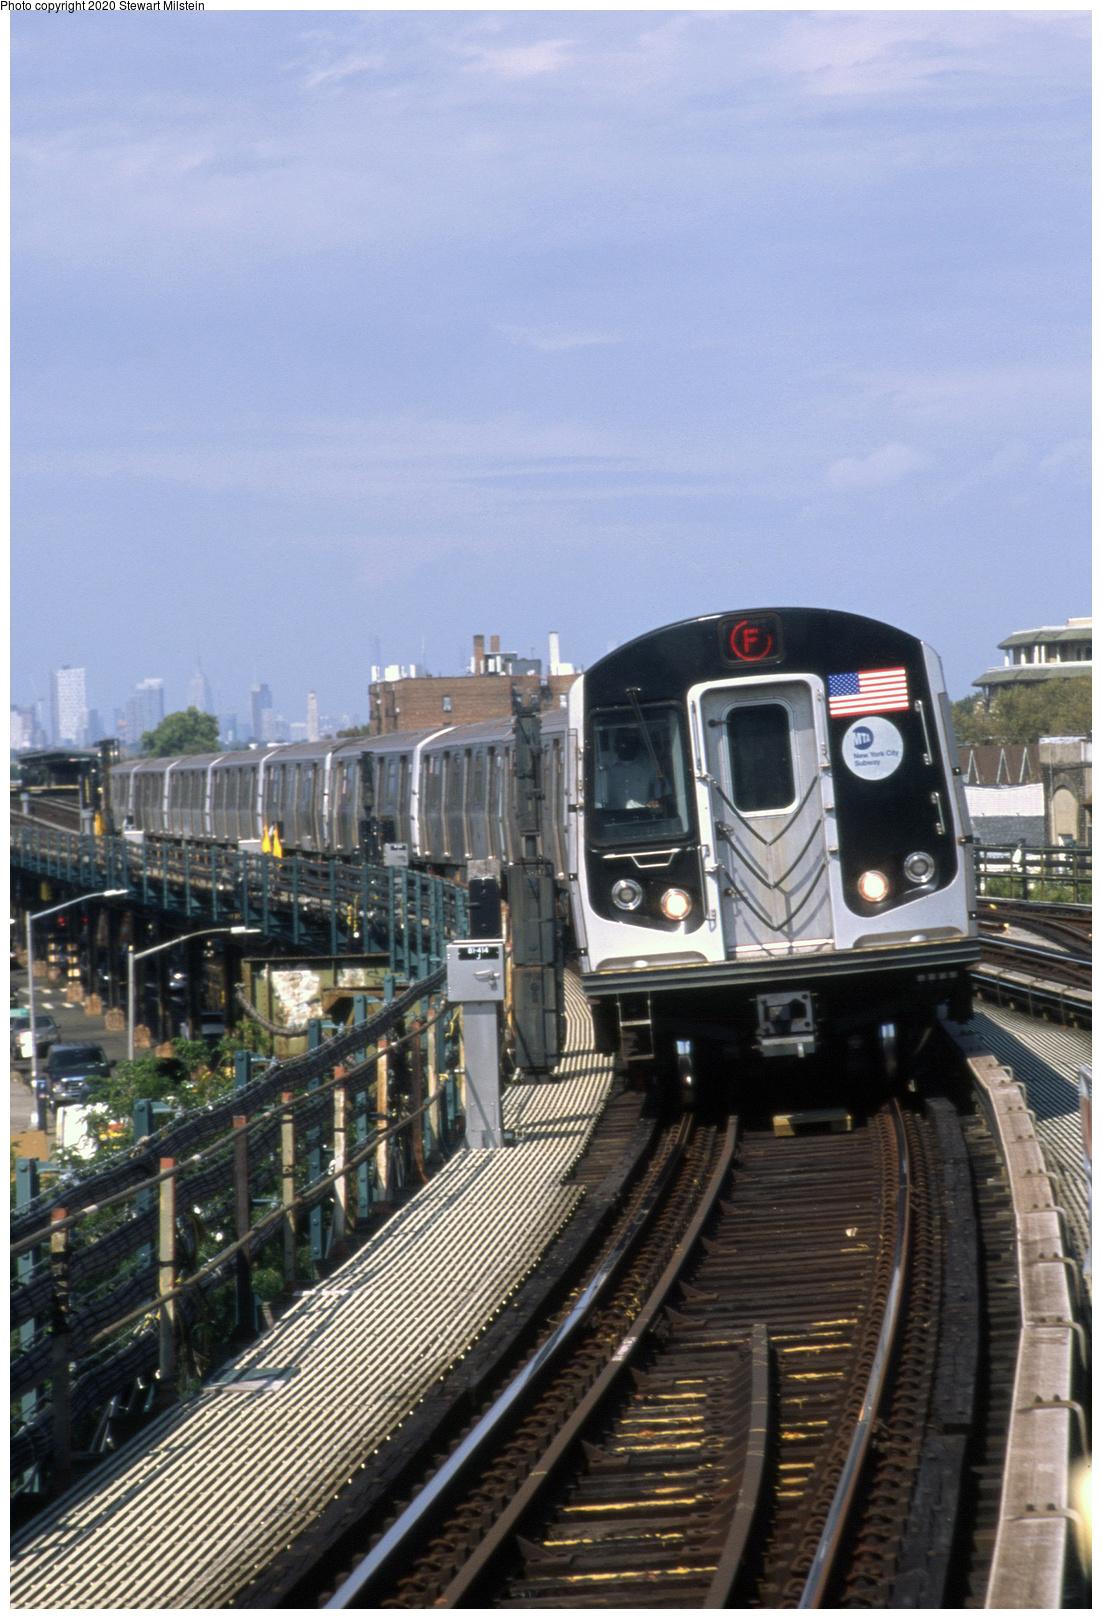 (779k, 1102x1619)<br><b>Country:</b> United States<br><b>City:</b> New York<br><b>System:</b> New York City Transit<br><b>Line:</b> BMT Culver Line<br><b>Location:</b> Kings Highway<br><b>Route:</b> F<br><b>Car:</b> R-160B (Option 1) (Kawasaki, 2008-2009) 9172 <br><b>Photo by:</b> Stewart Milstein<br><b>Date:</b> 9/27/2019<br><b>Viewed (this week/total):</b> 1 / 267